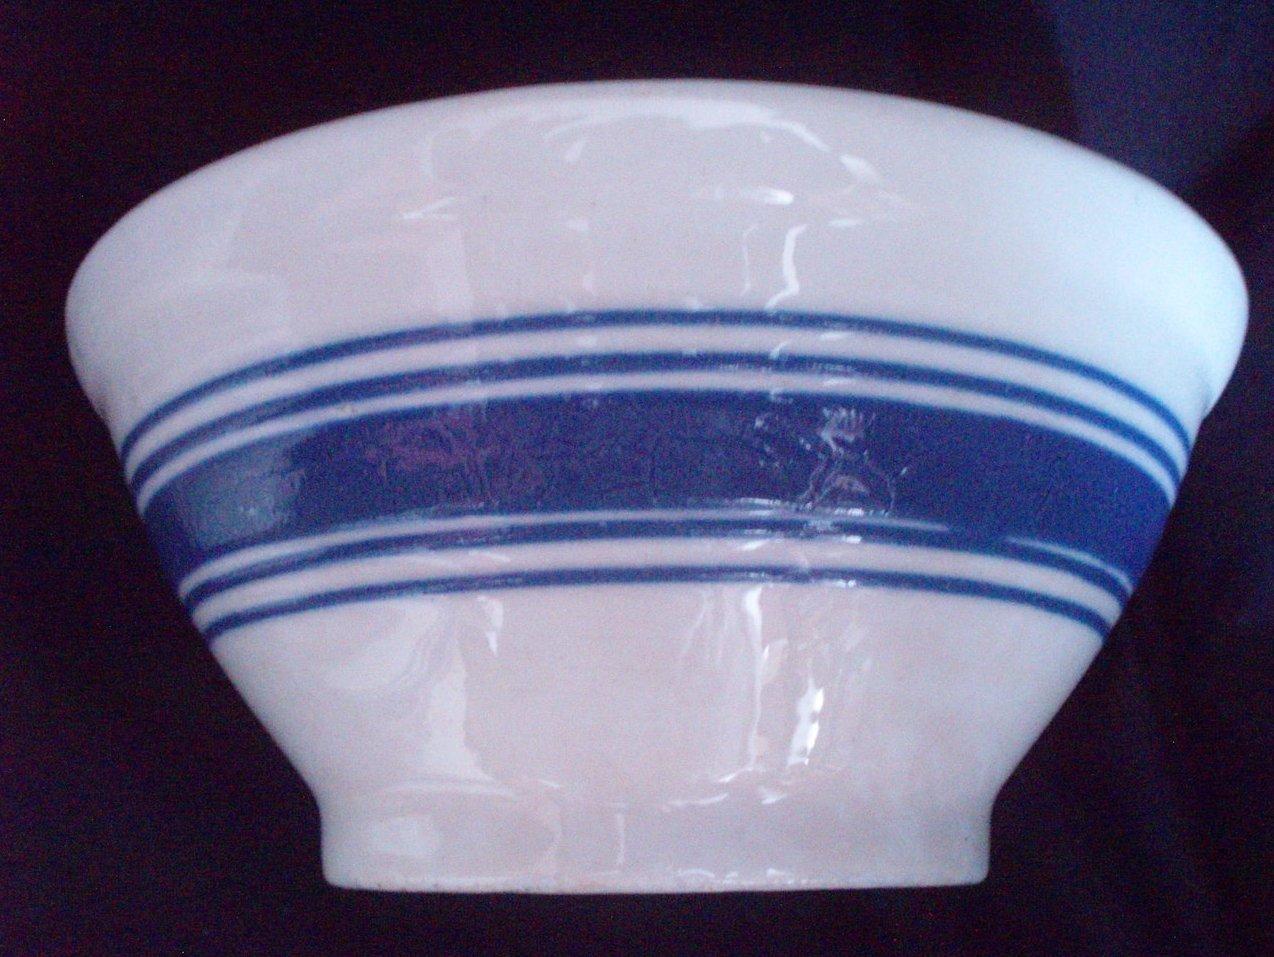 kitchen pottery canisters valances for windows vintage glazed mixing bowl set royal blue banding